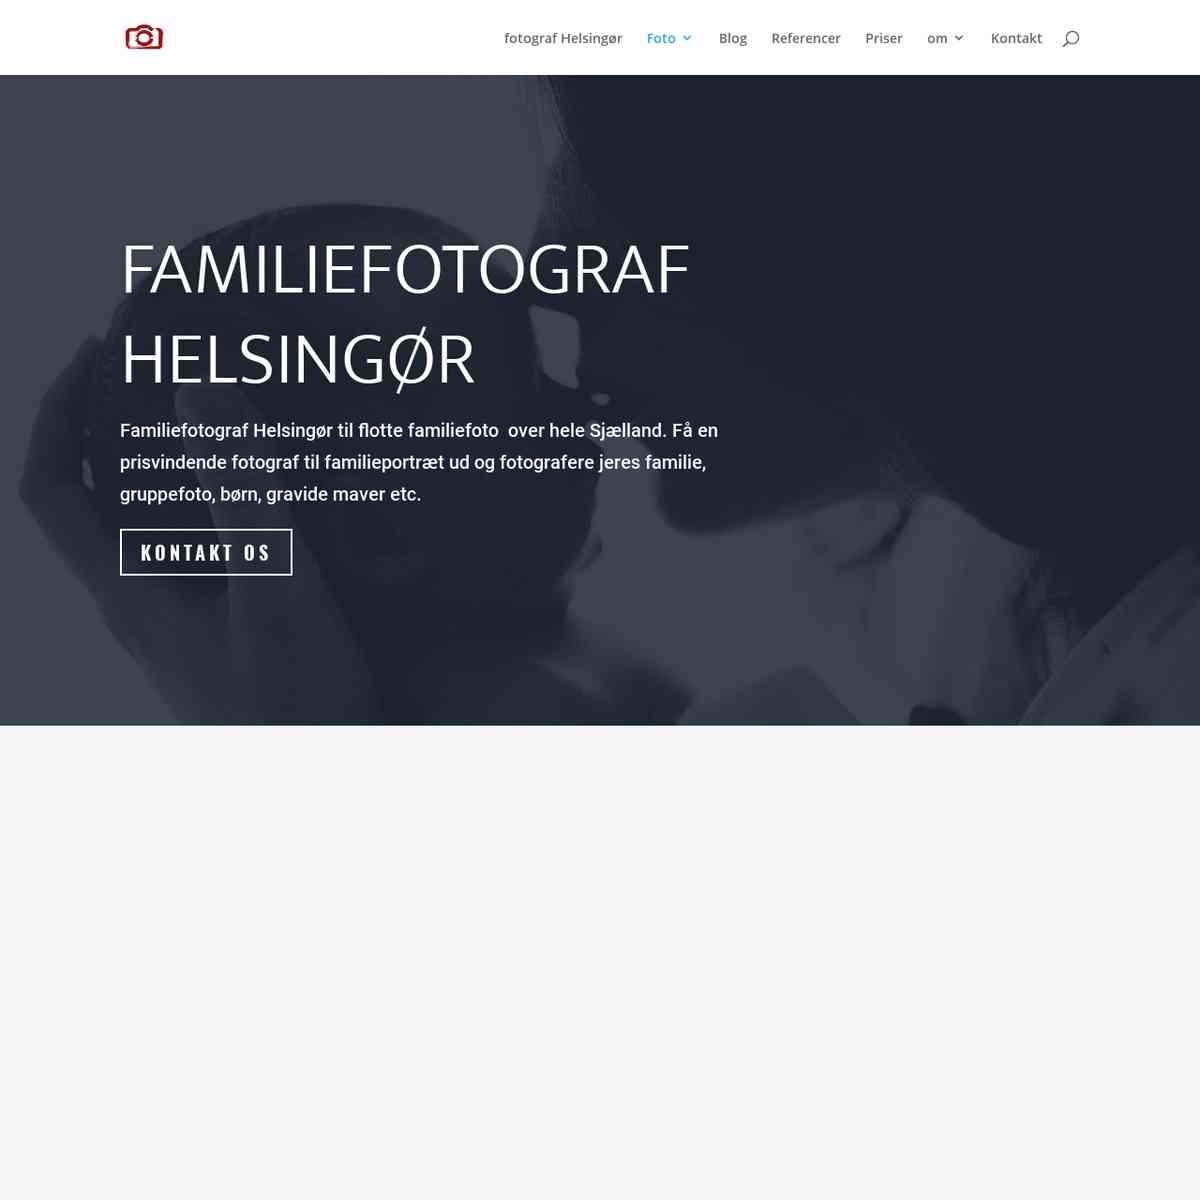 Familiefotograf